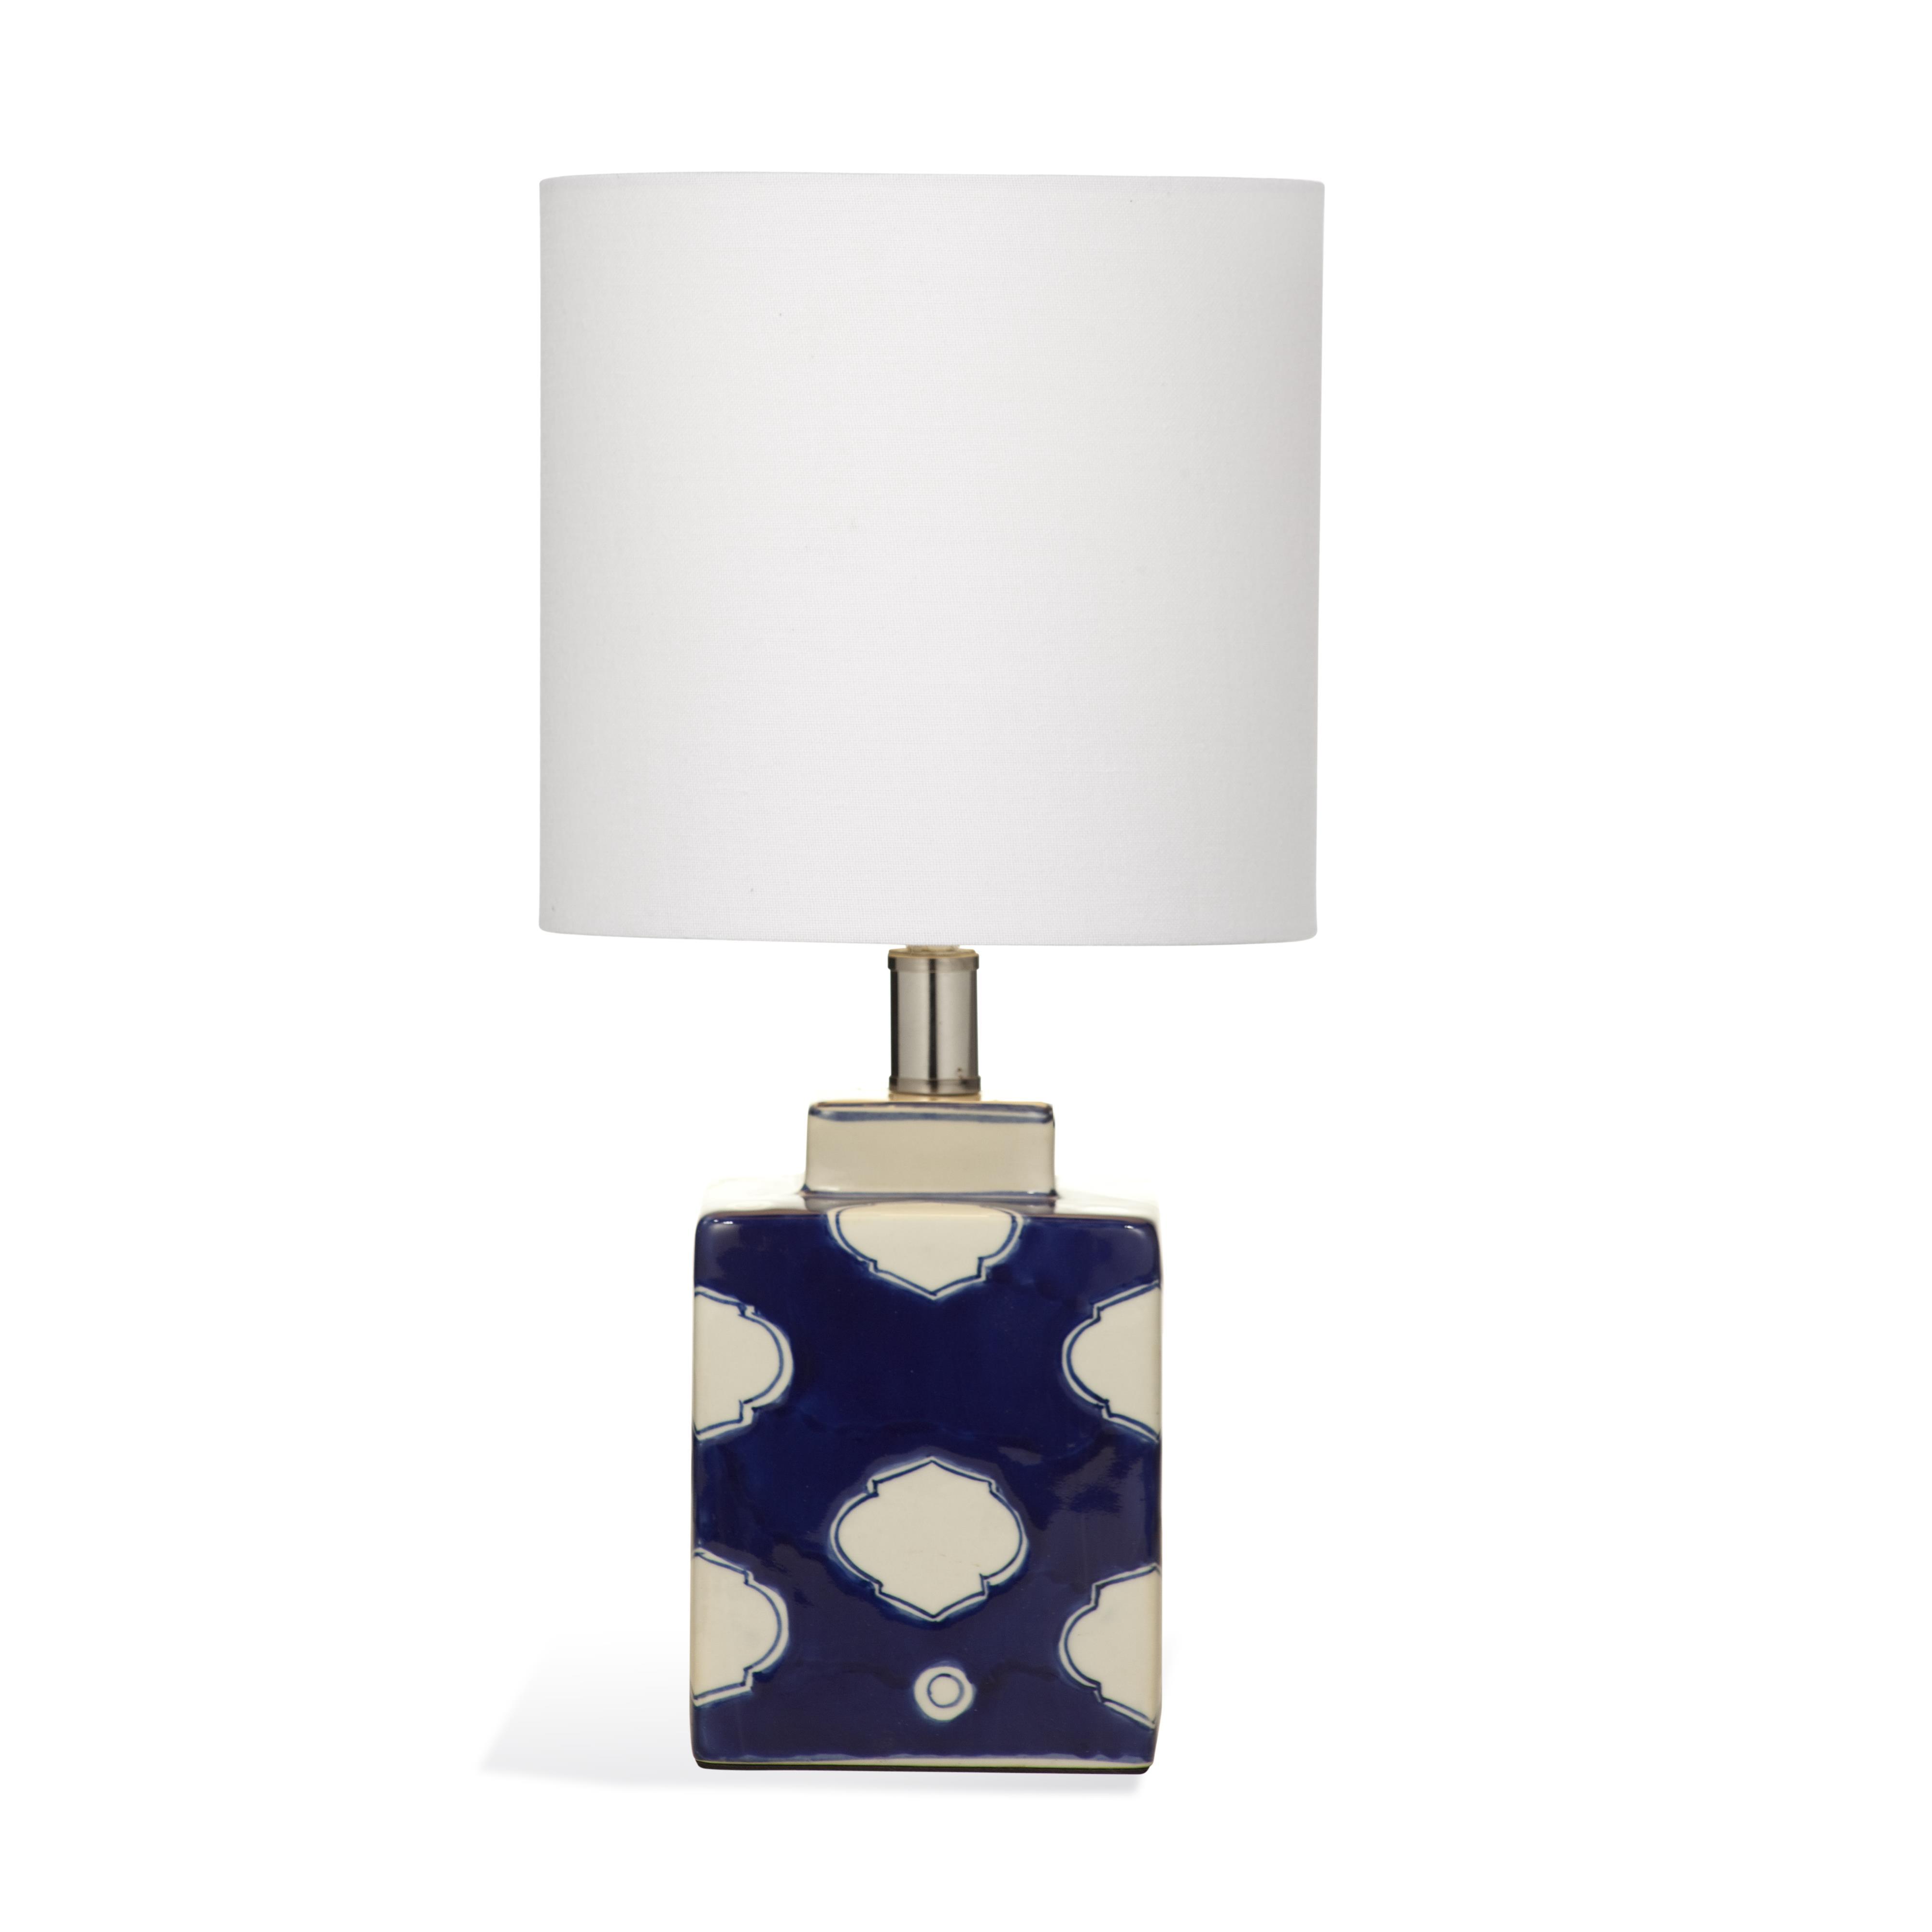 Thoroughly Modern Carmi Table Lamp by Bassett Mirror at Alison Craig Home Furnishings